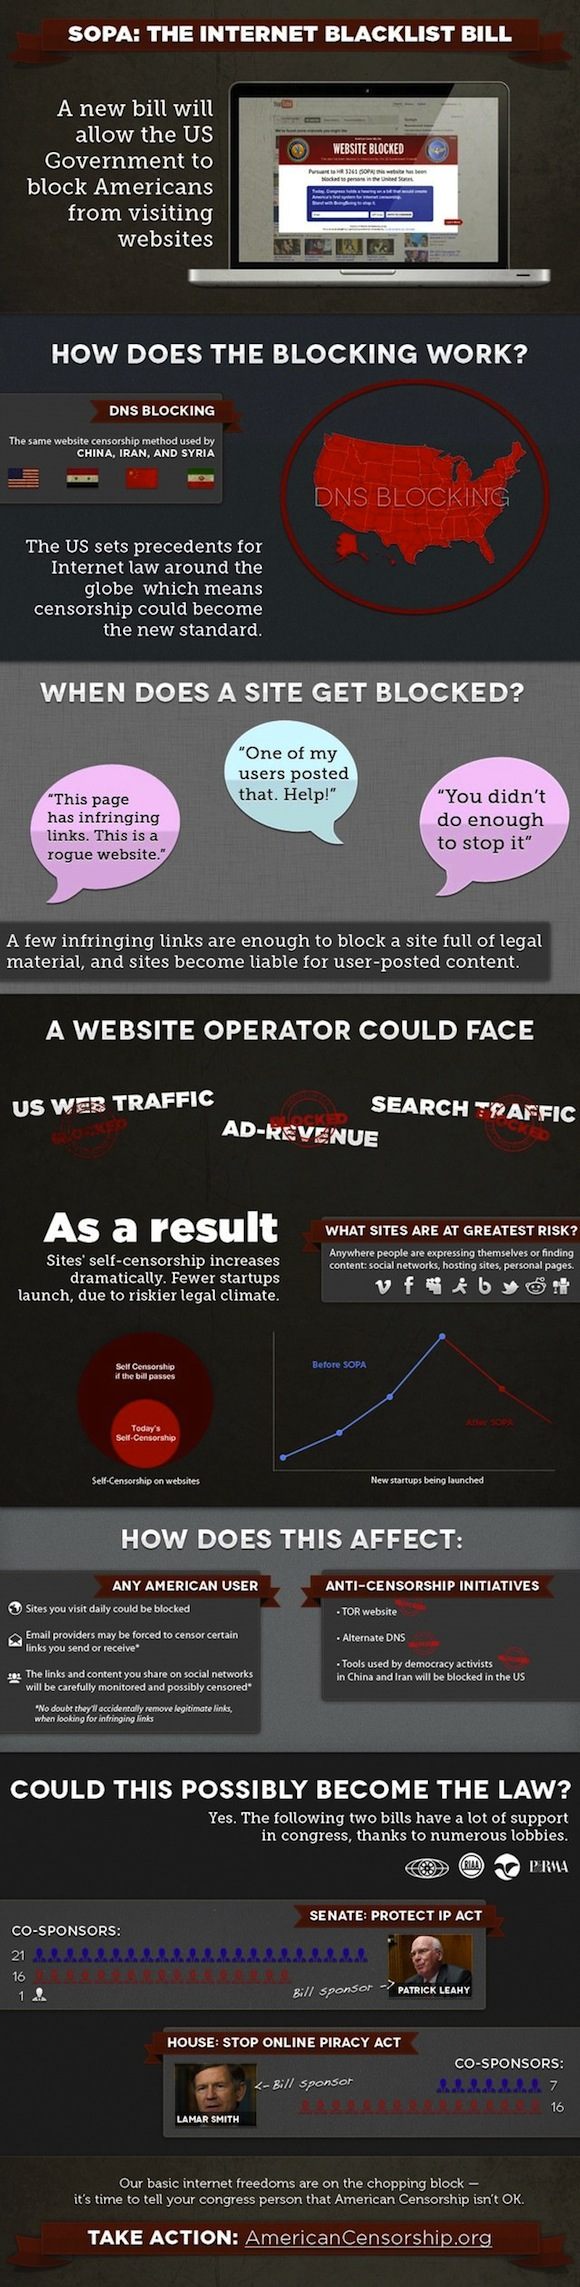 SOPA Infografia Al que no quiere caldo... le dan SOPA